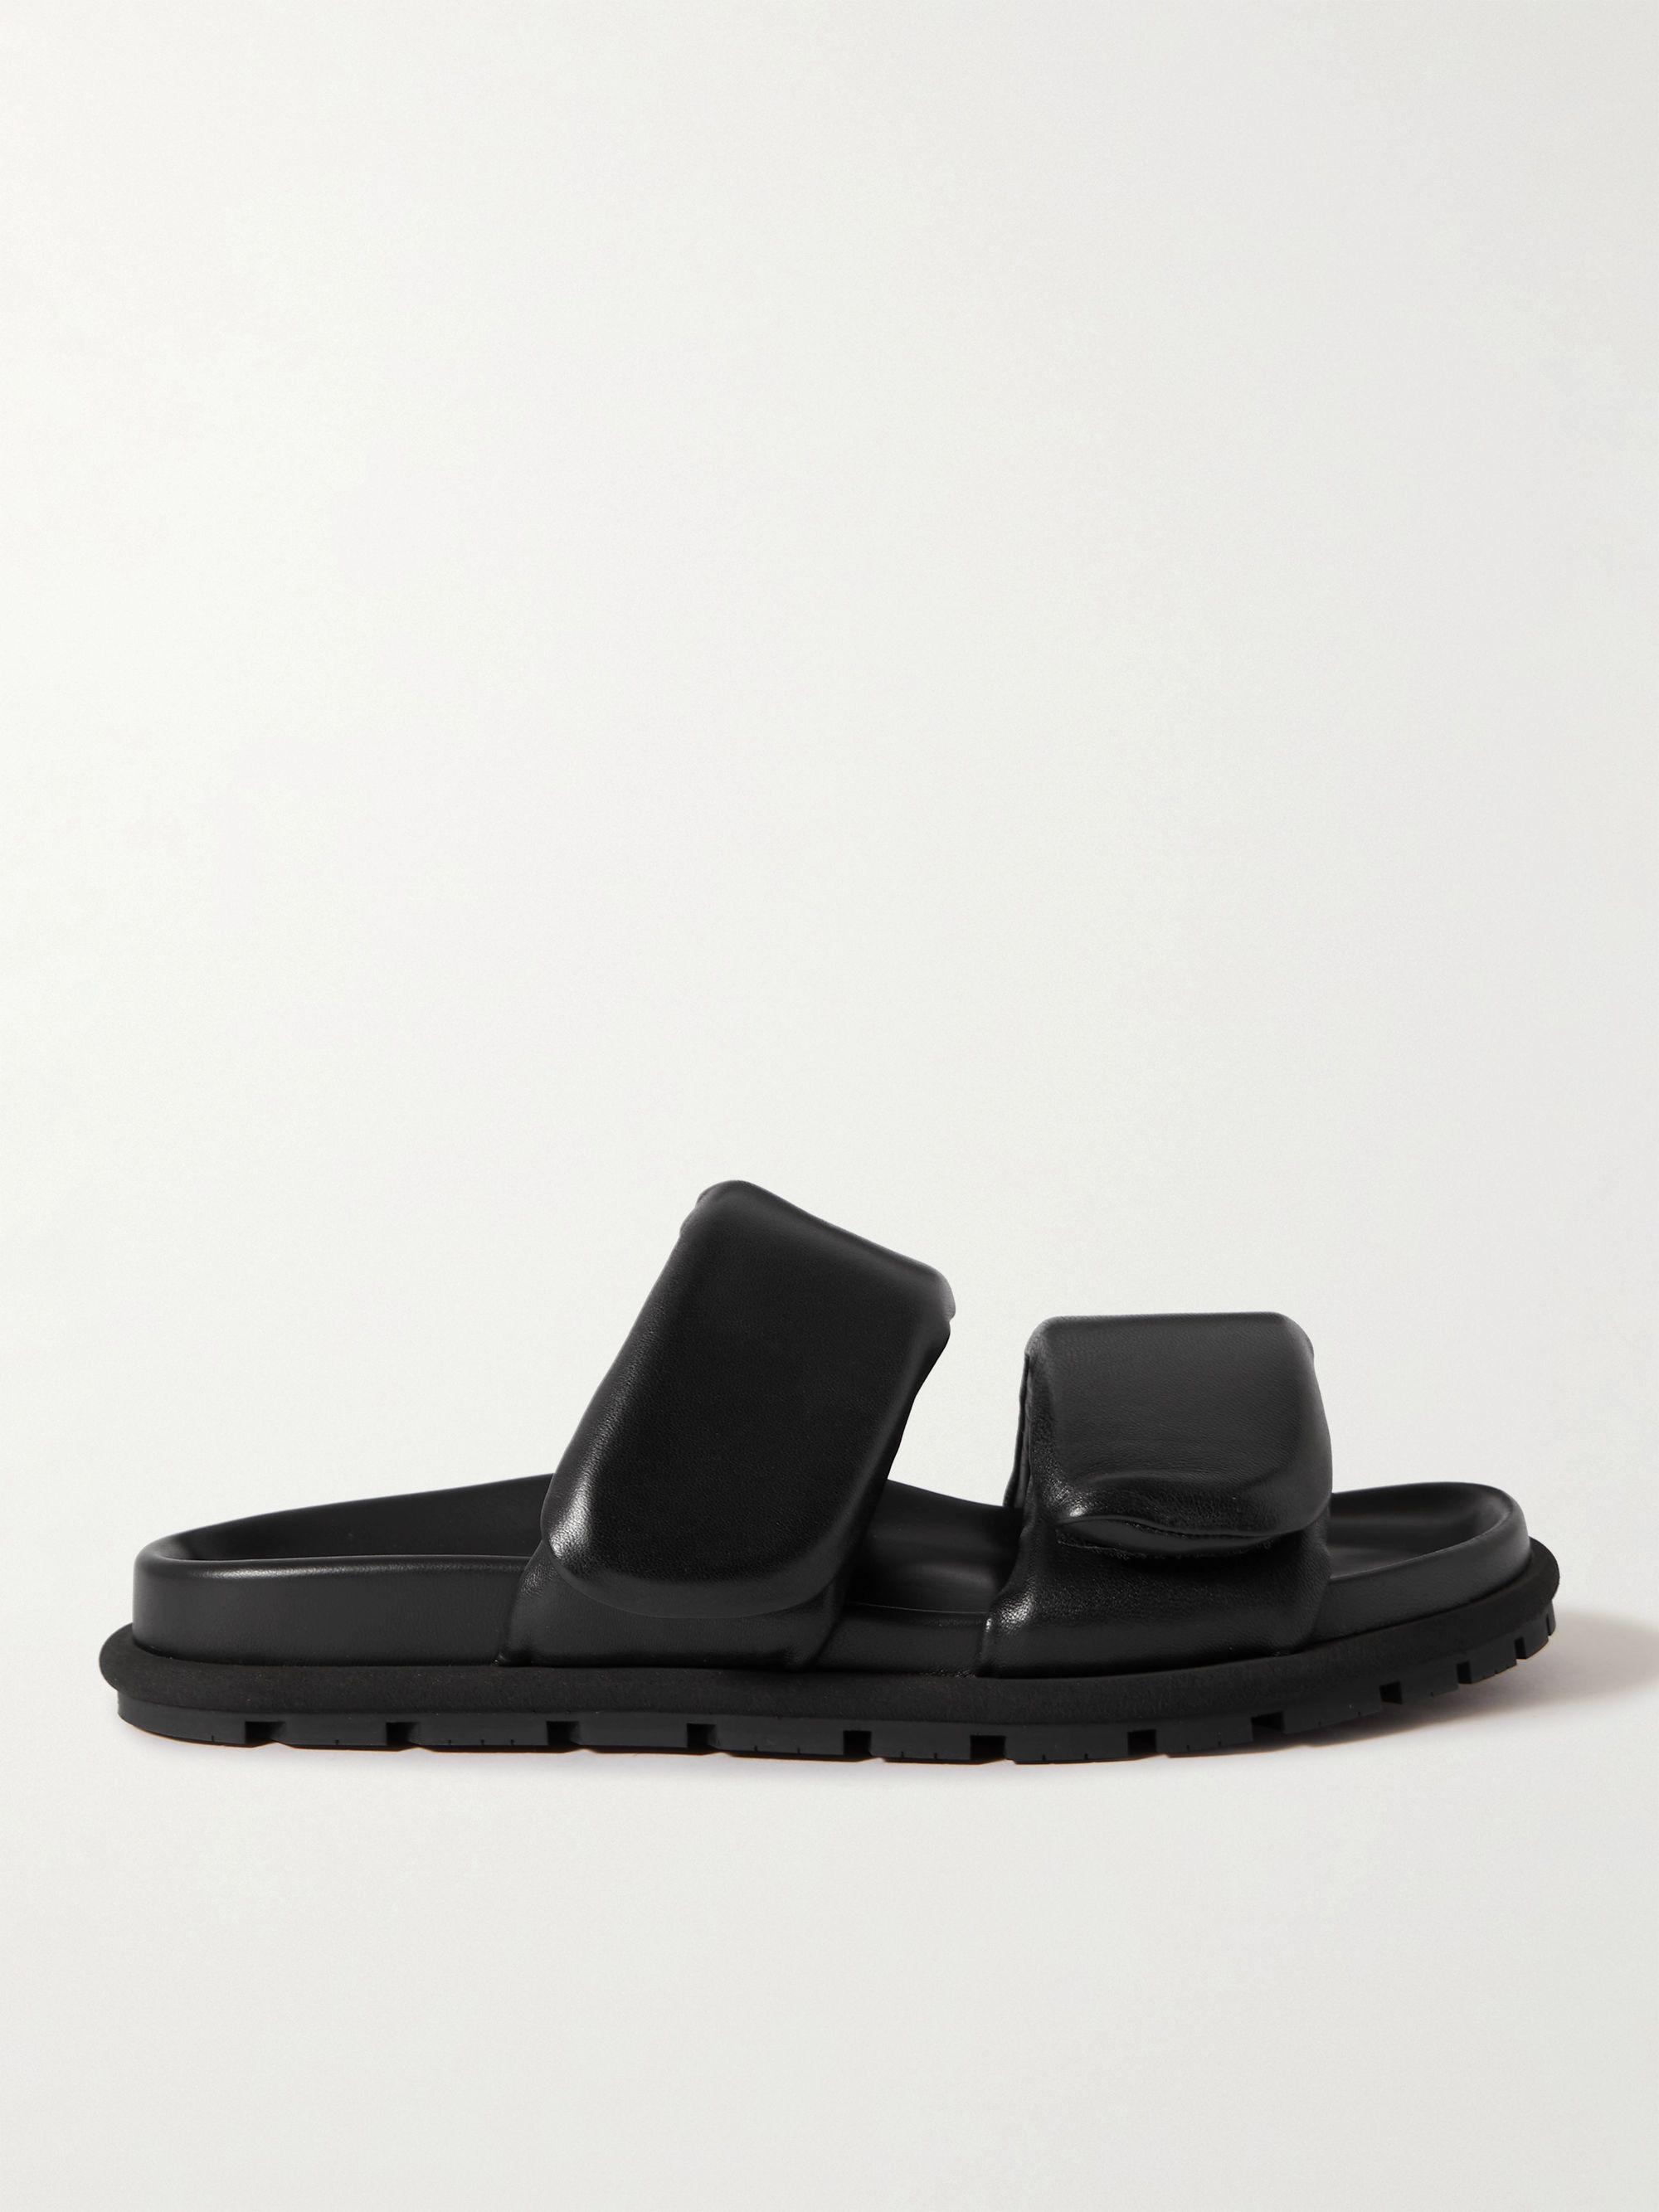 Dries Van Noten Padded Nylon and Leather Slides,Black